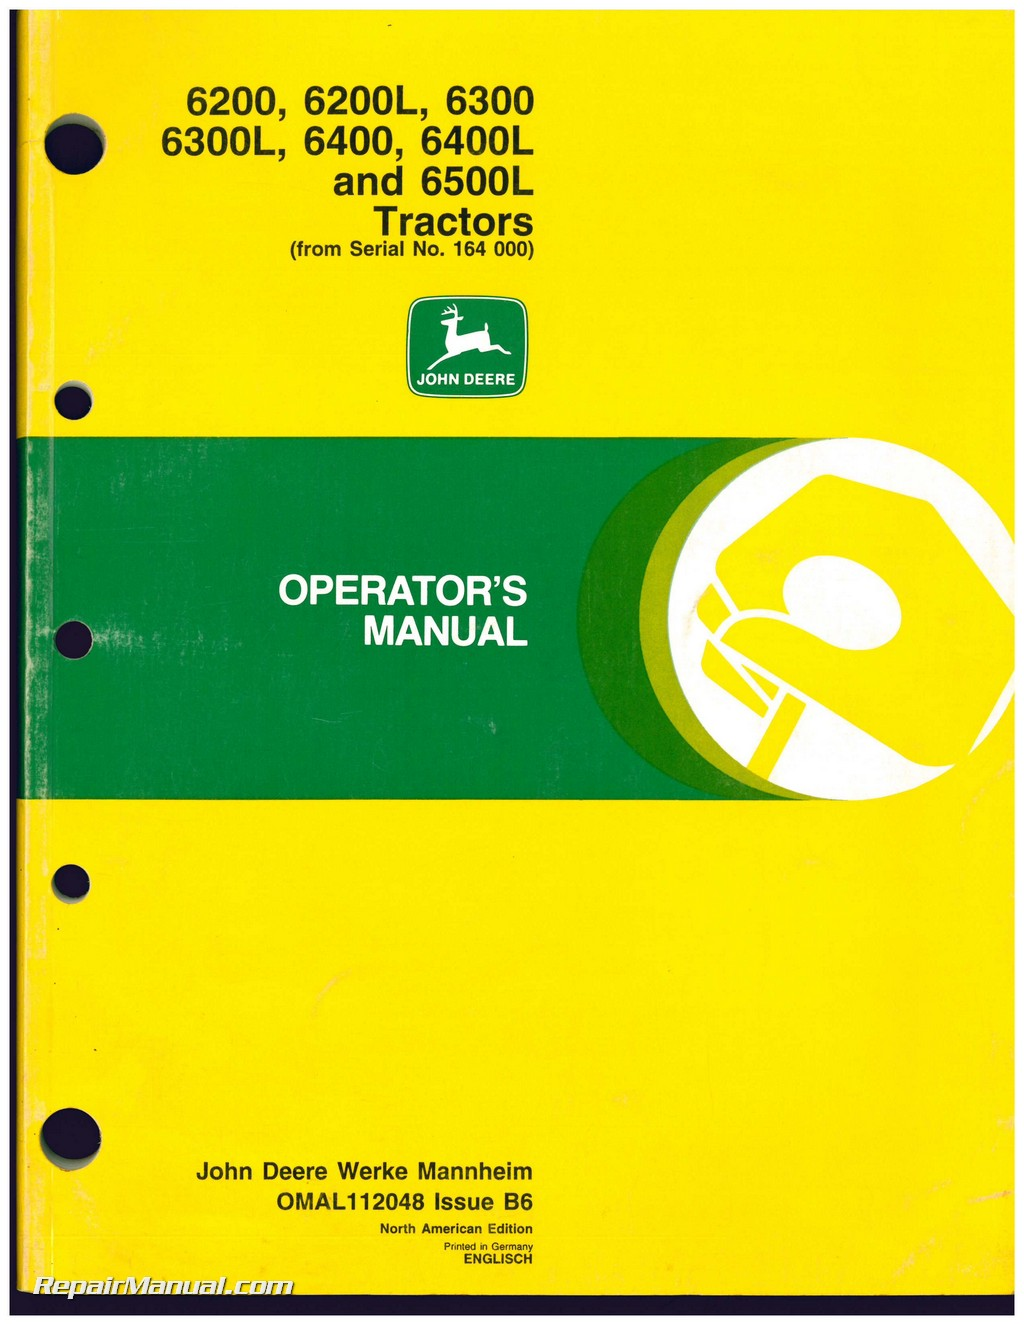 used john deere 6200 6200l 6300 6300l 6400 6400l and 6500l rh repairmanual com john deere 6300 service manual john deere 6300 workshop manual